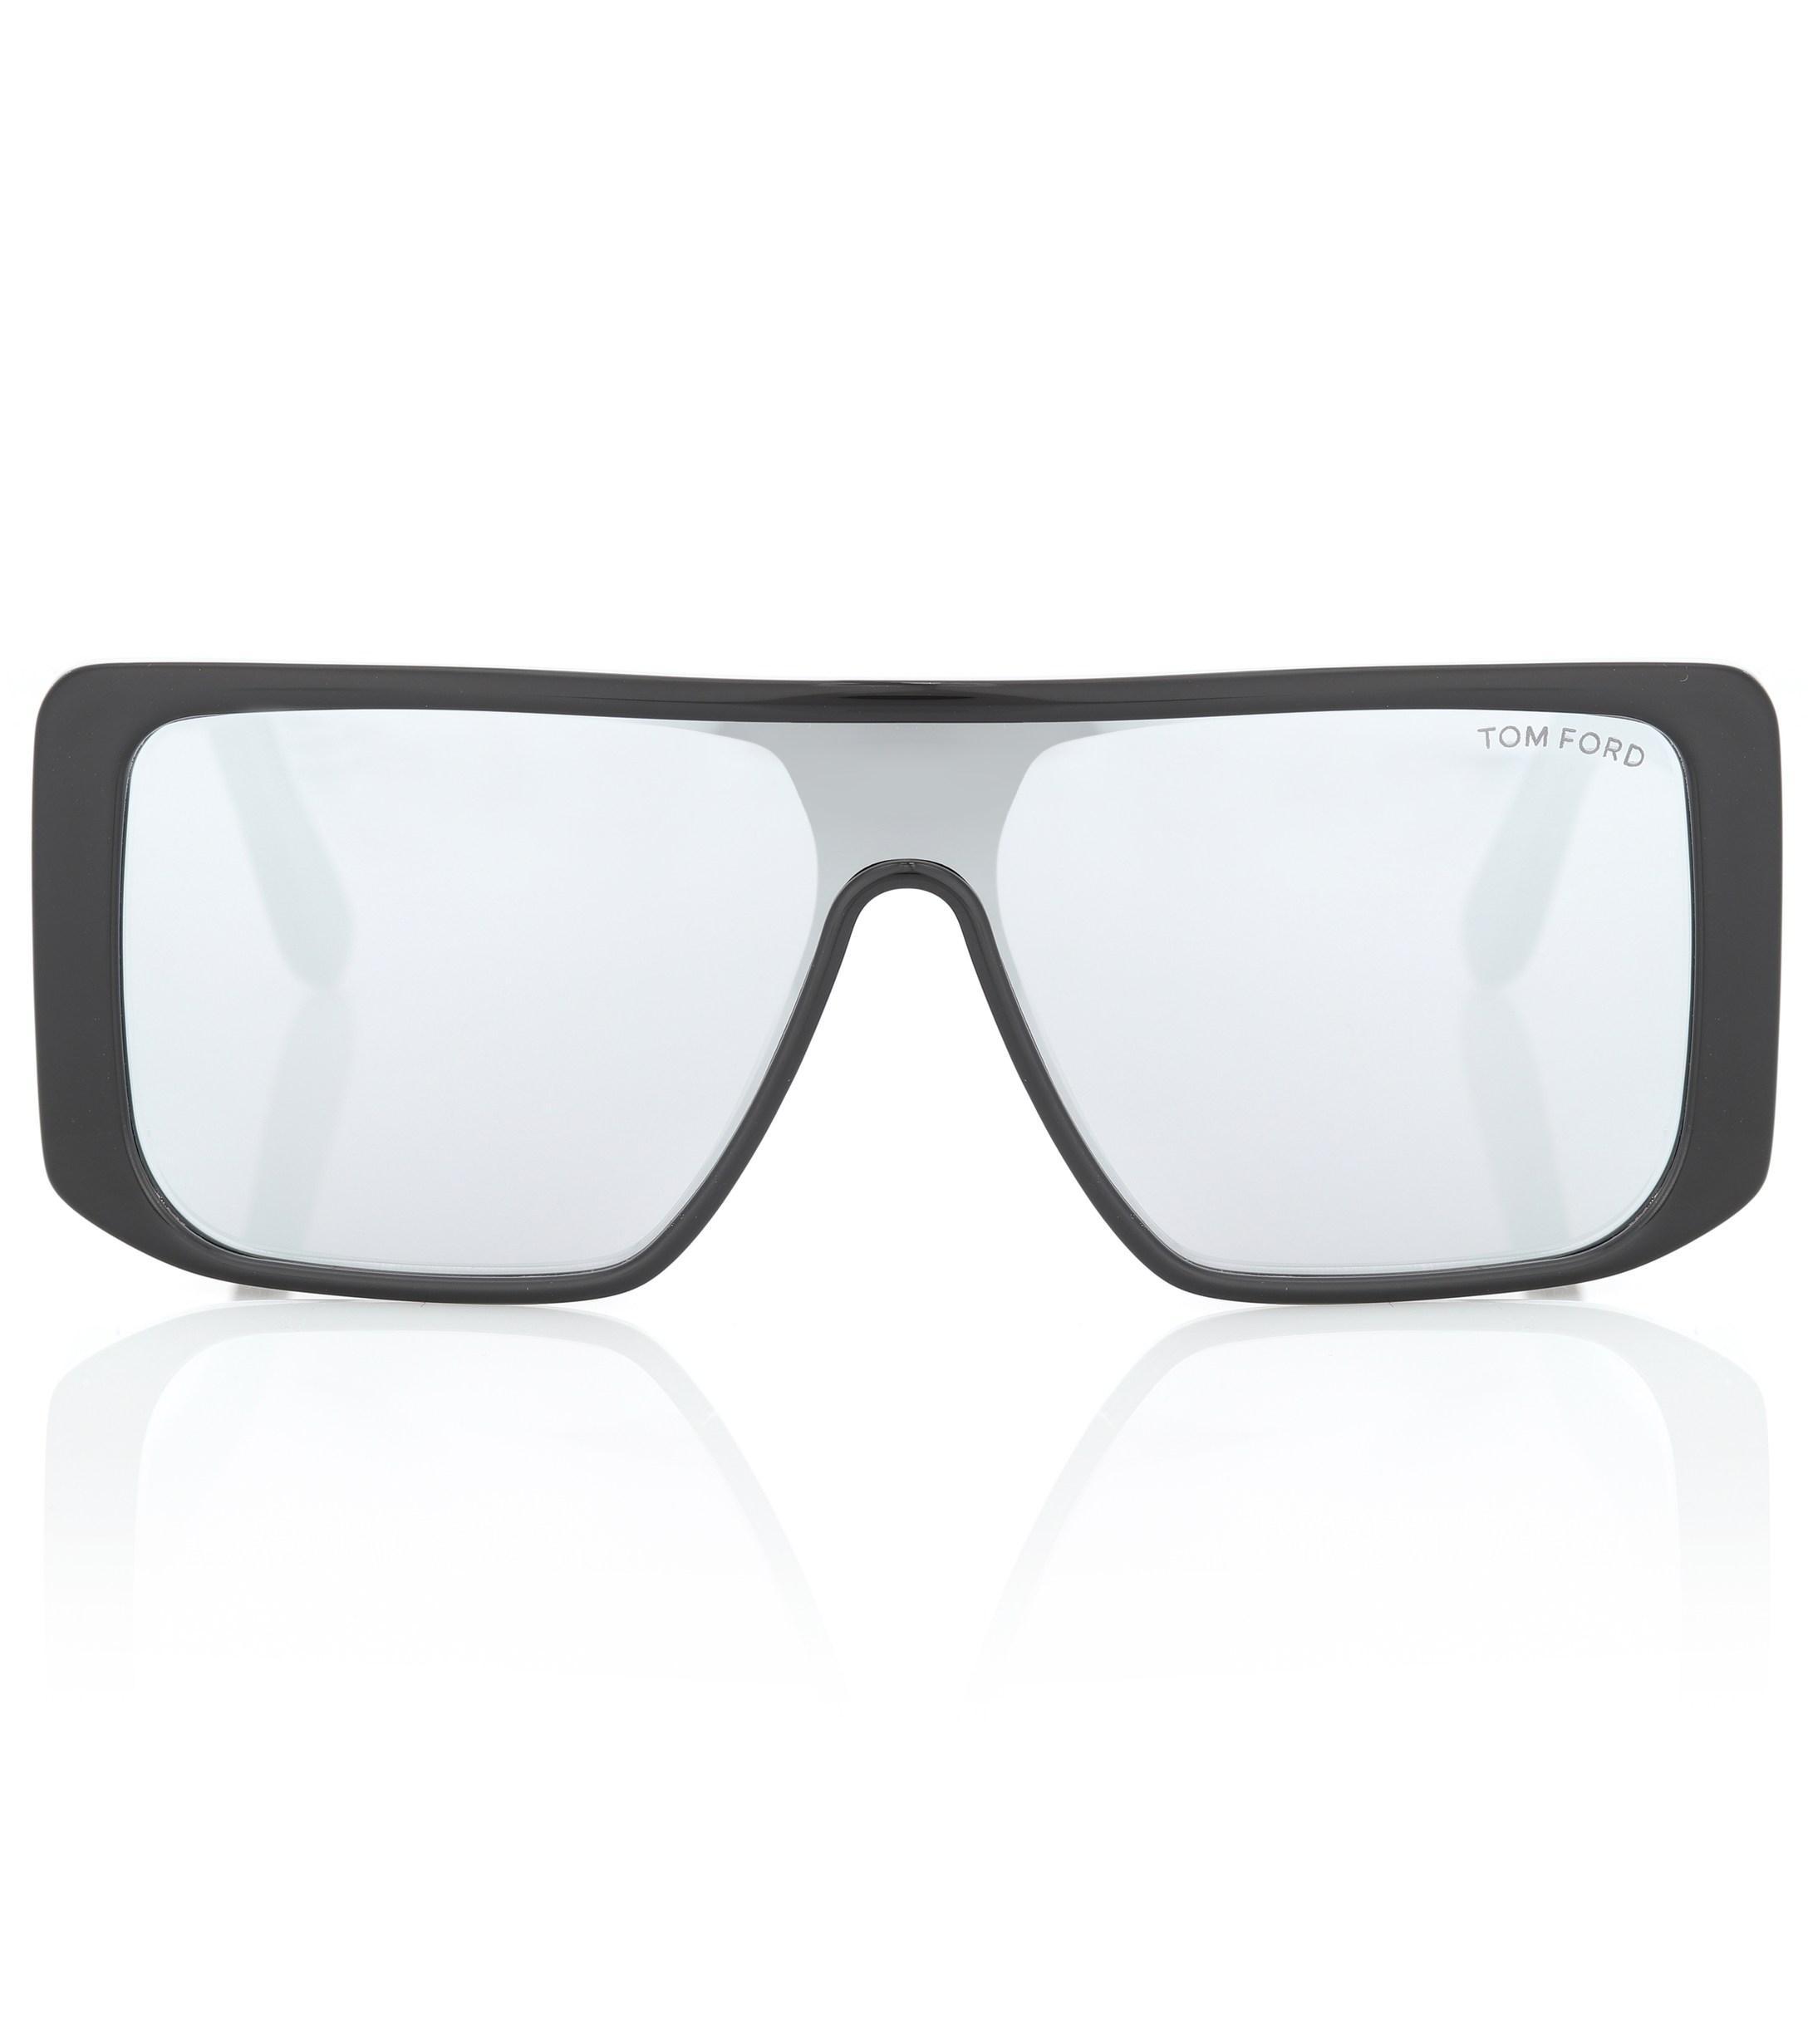 1b99f83273 Tom Ford - Black Atticus Rectangular Acetate Sunglasses - Lyst. View  fullscreen